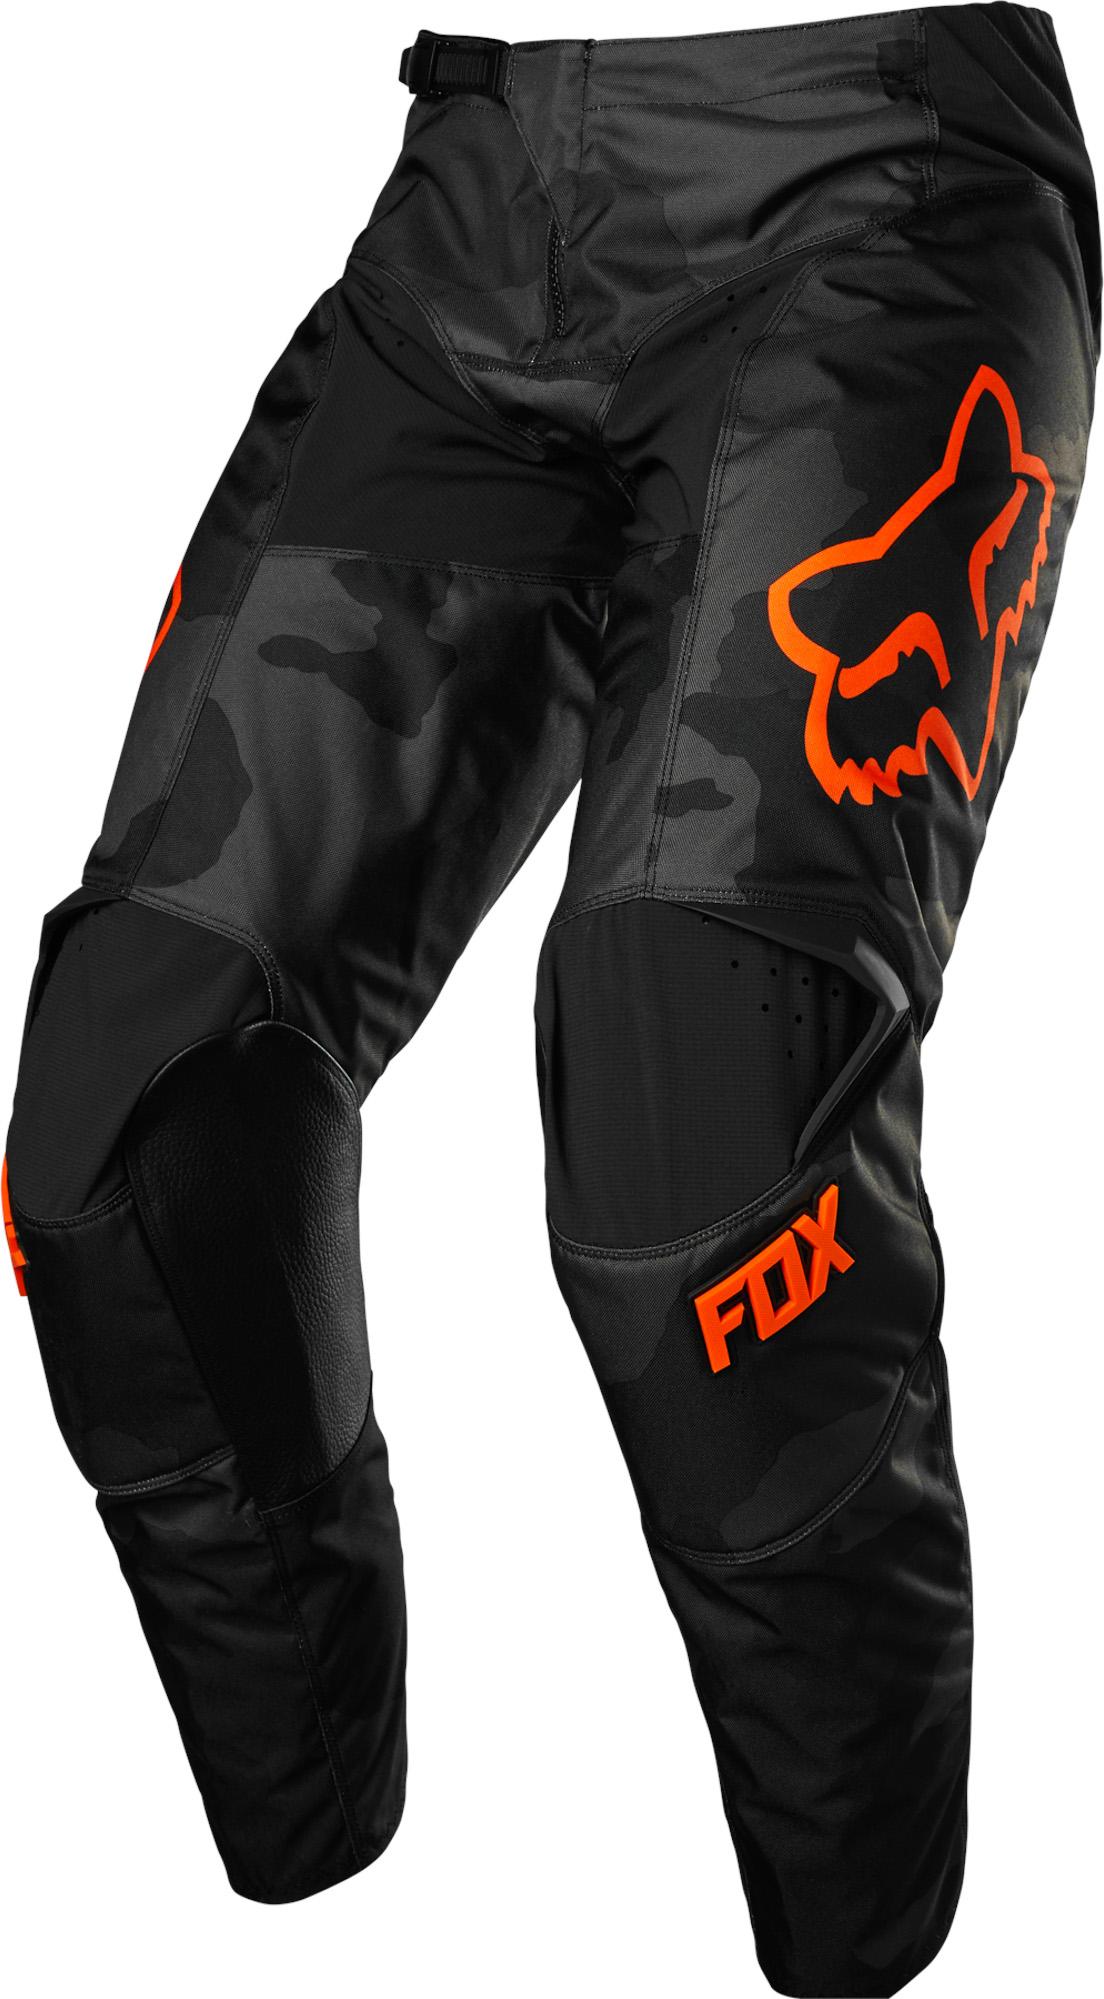 FOX 180 Trev Pant - BLACK CAMO MX22